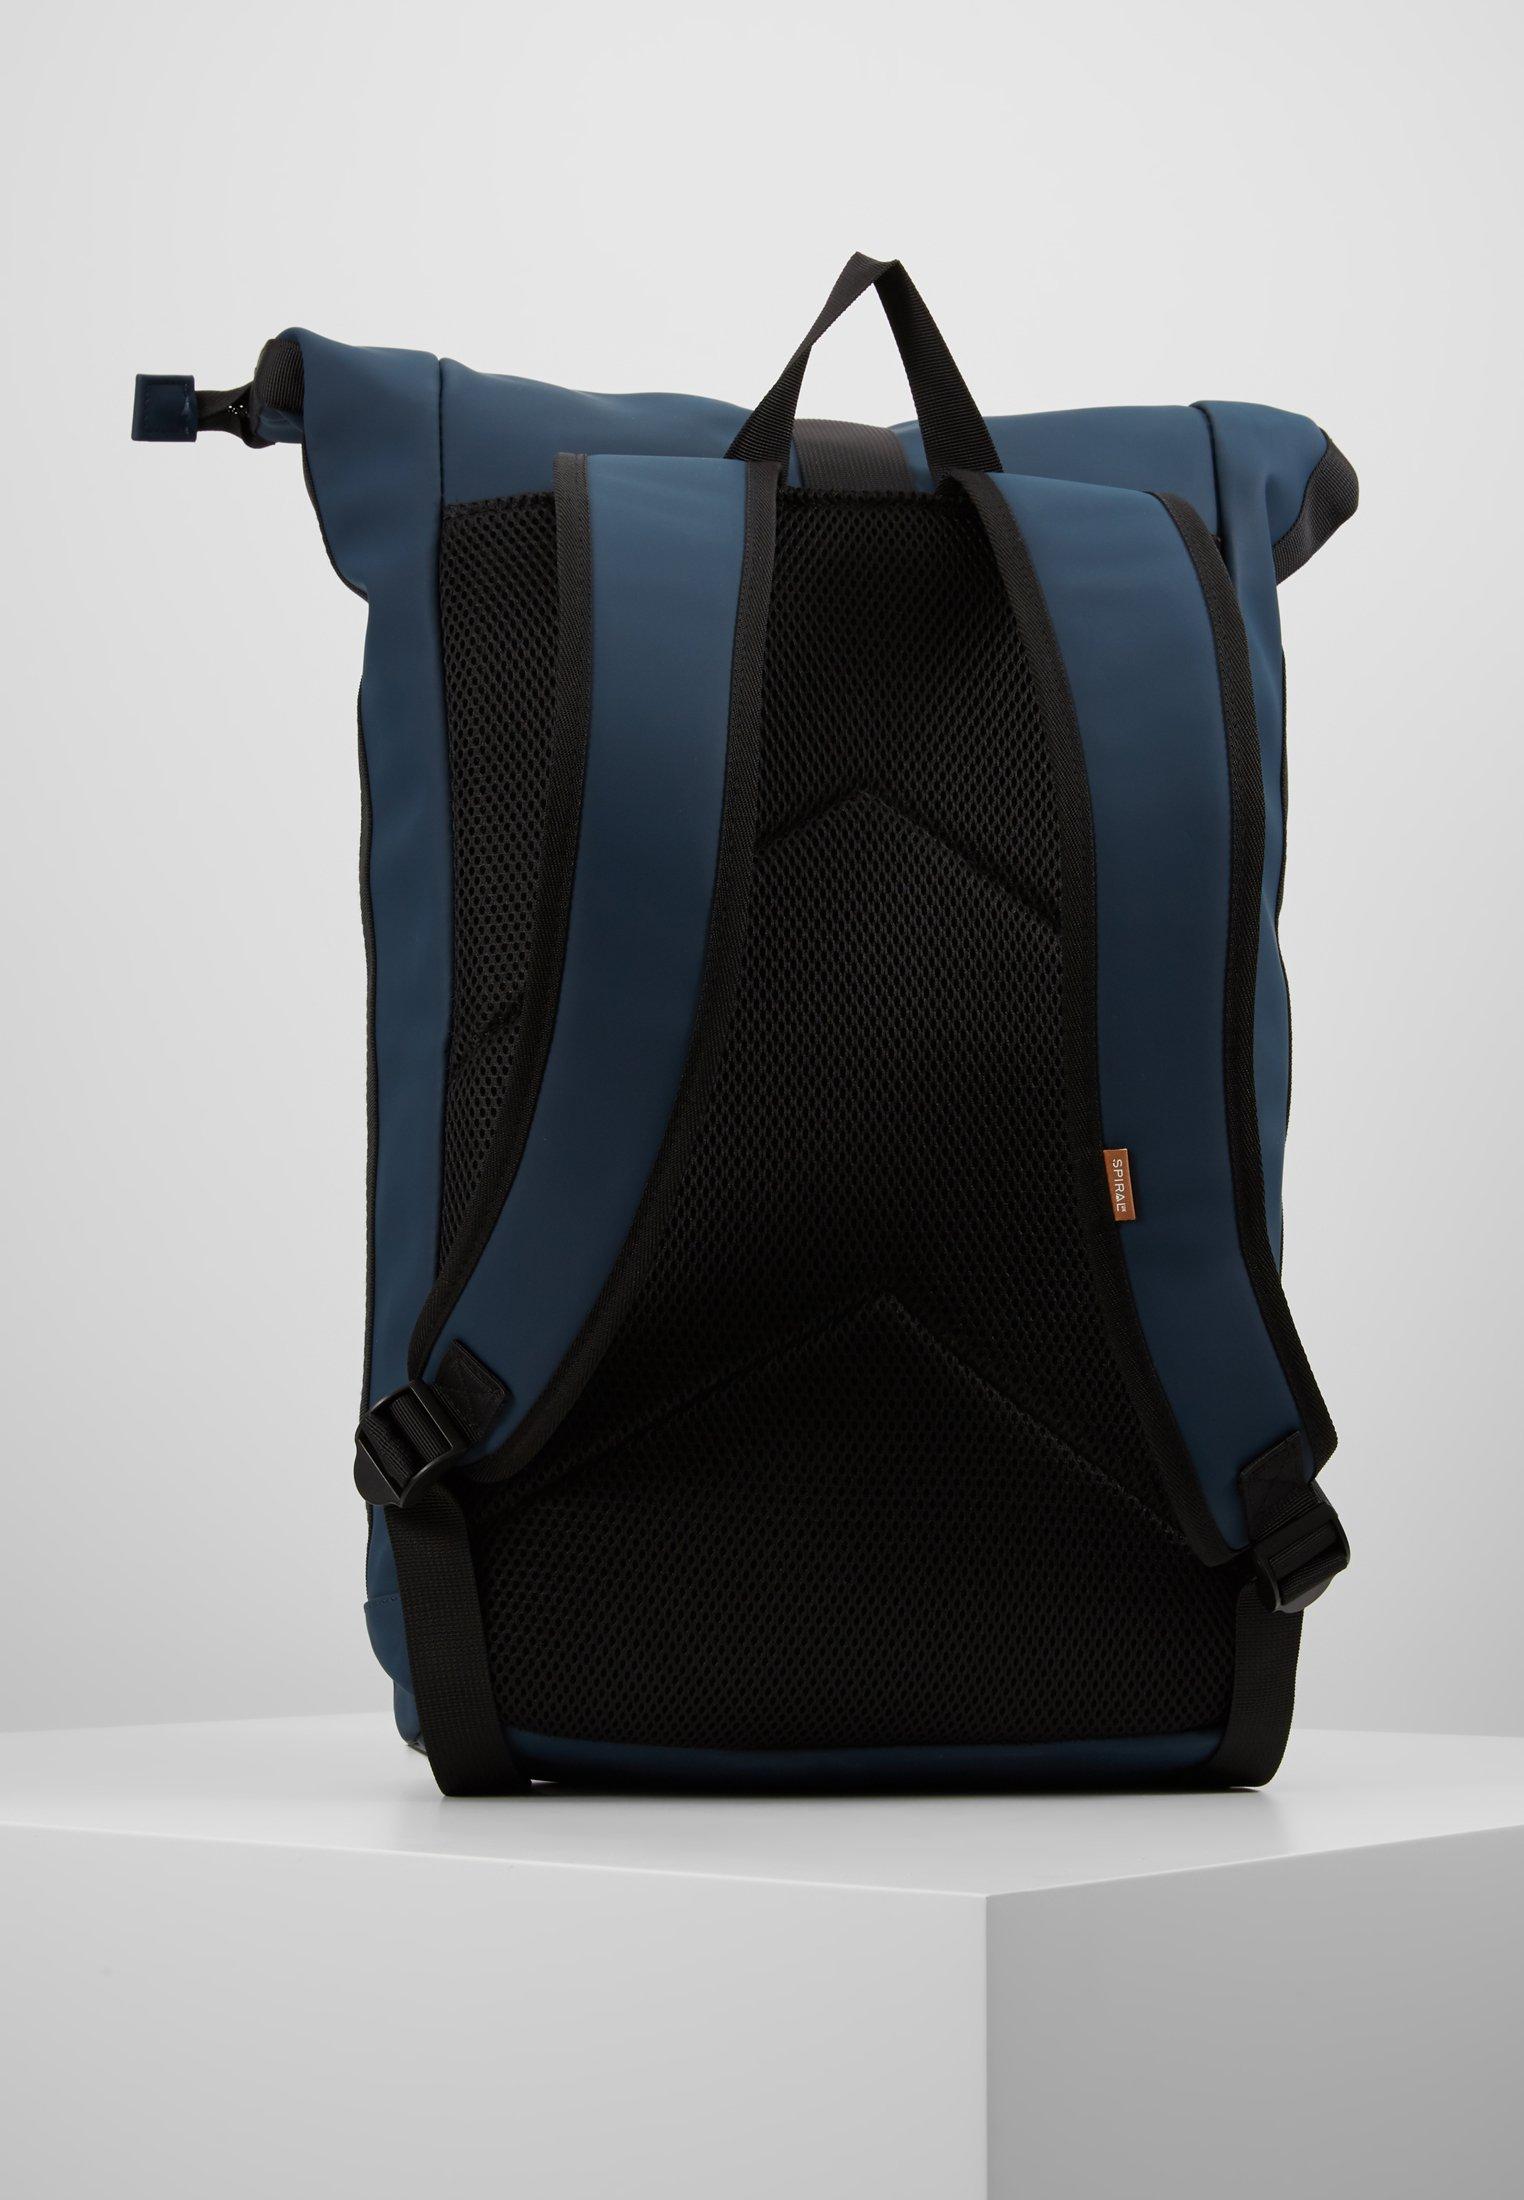 Spiral Bags STADIUM - Tagesrucksack - navy/dunkelblau - Herrentaschen pgcNI